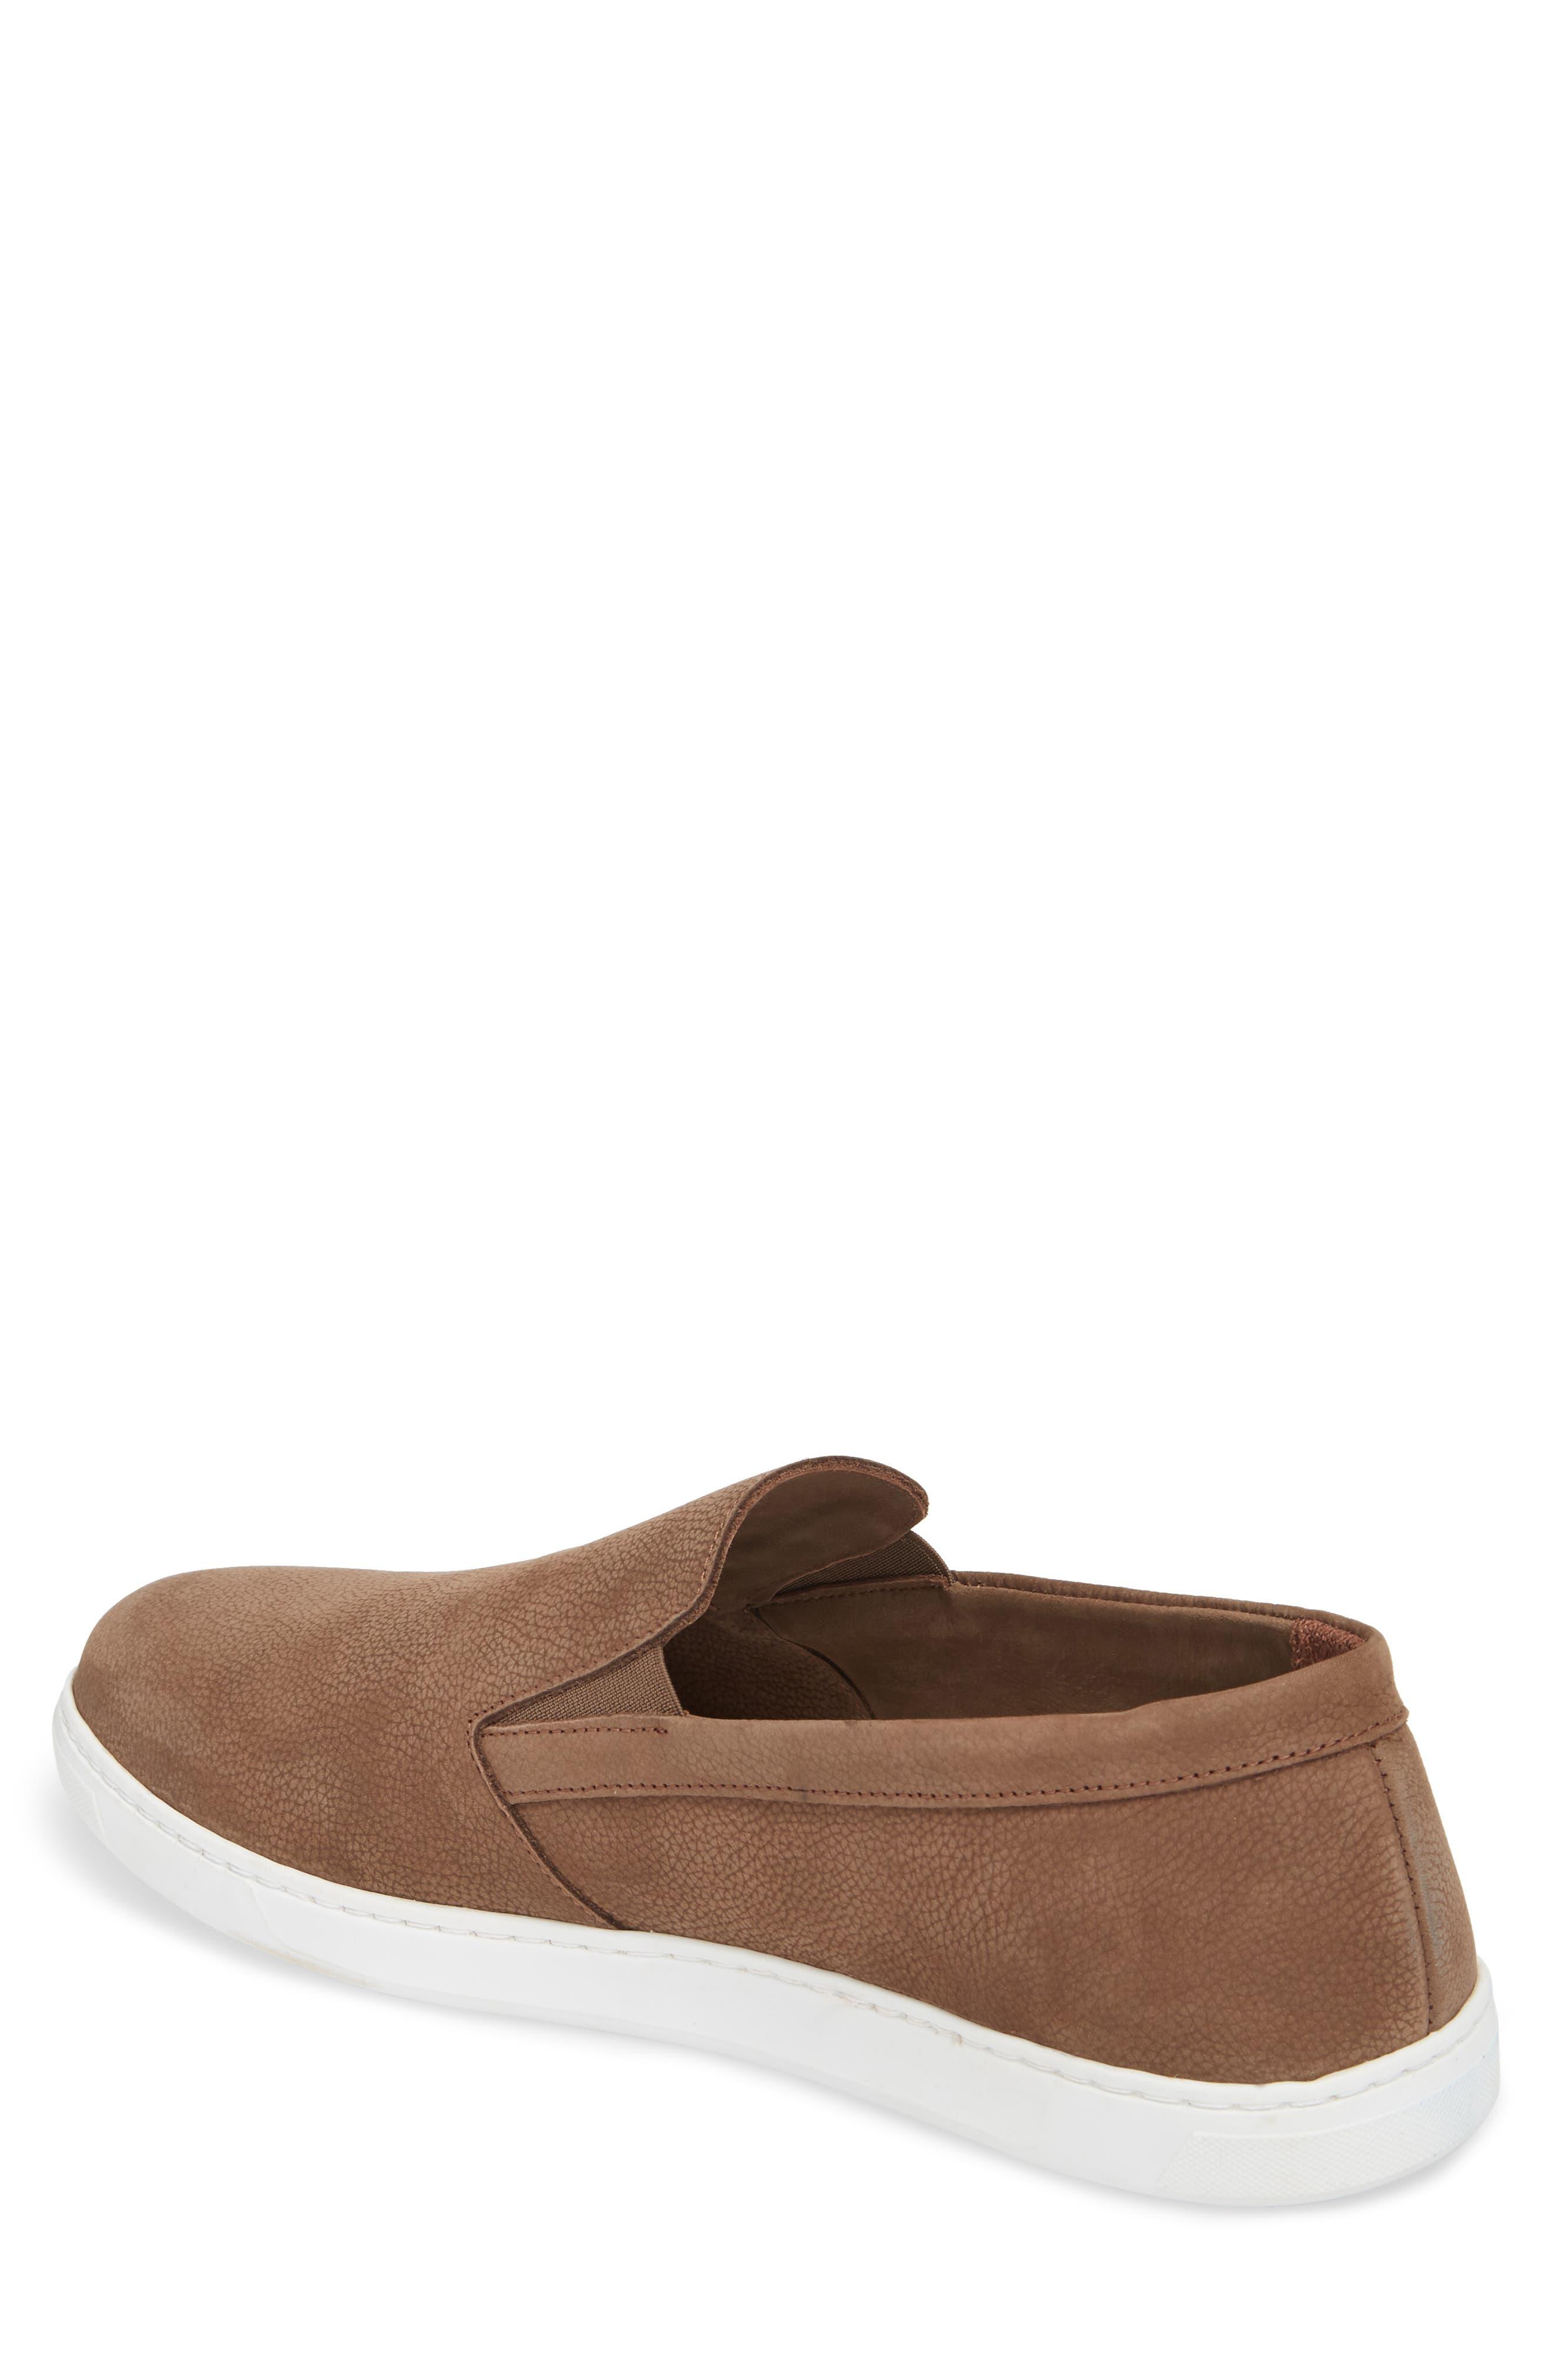 Neff Slip-On Sneaker,                             Alternate thumbnail 2, color,                             Taupe Leather